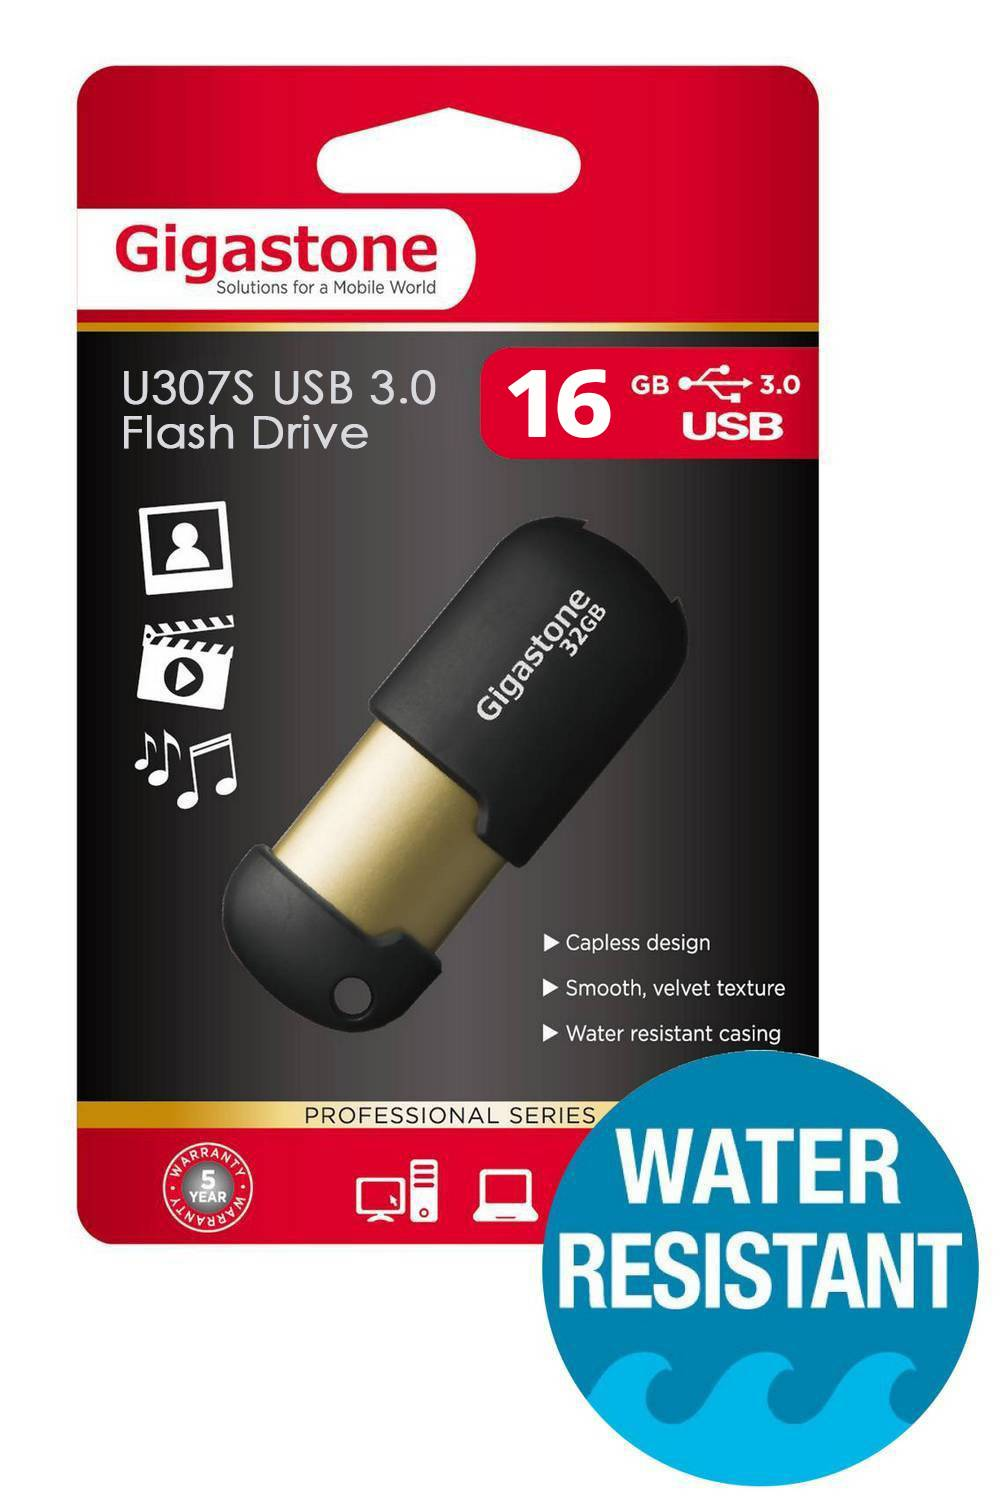 USB 3.0 Gigastone Flash Drive U307S 16GB Μαύρο Professional Series Metal Frame